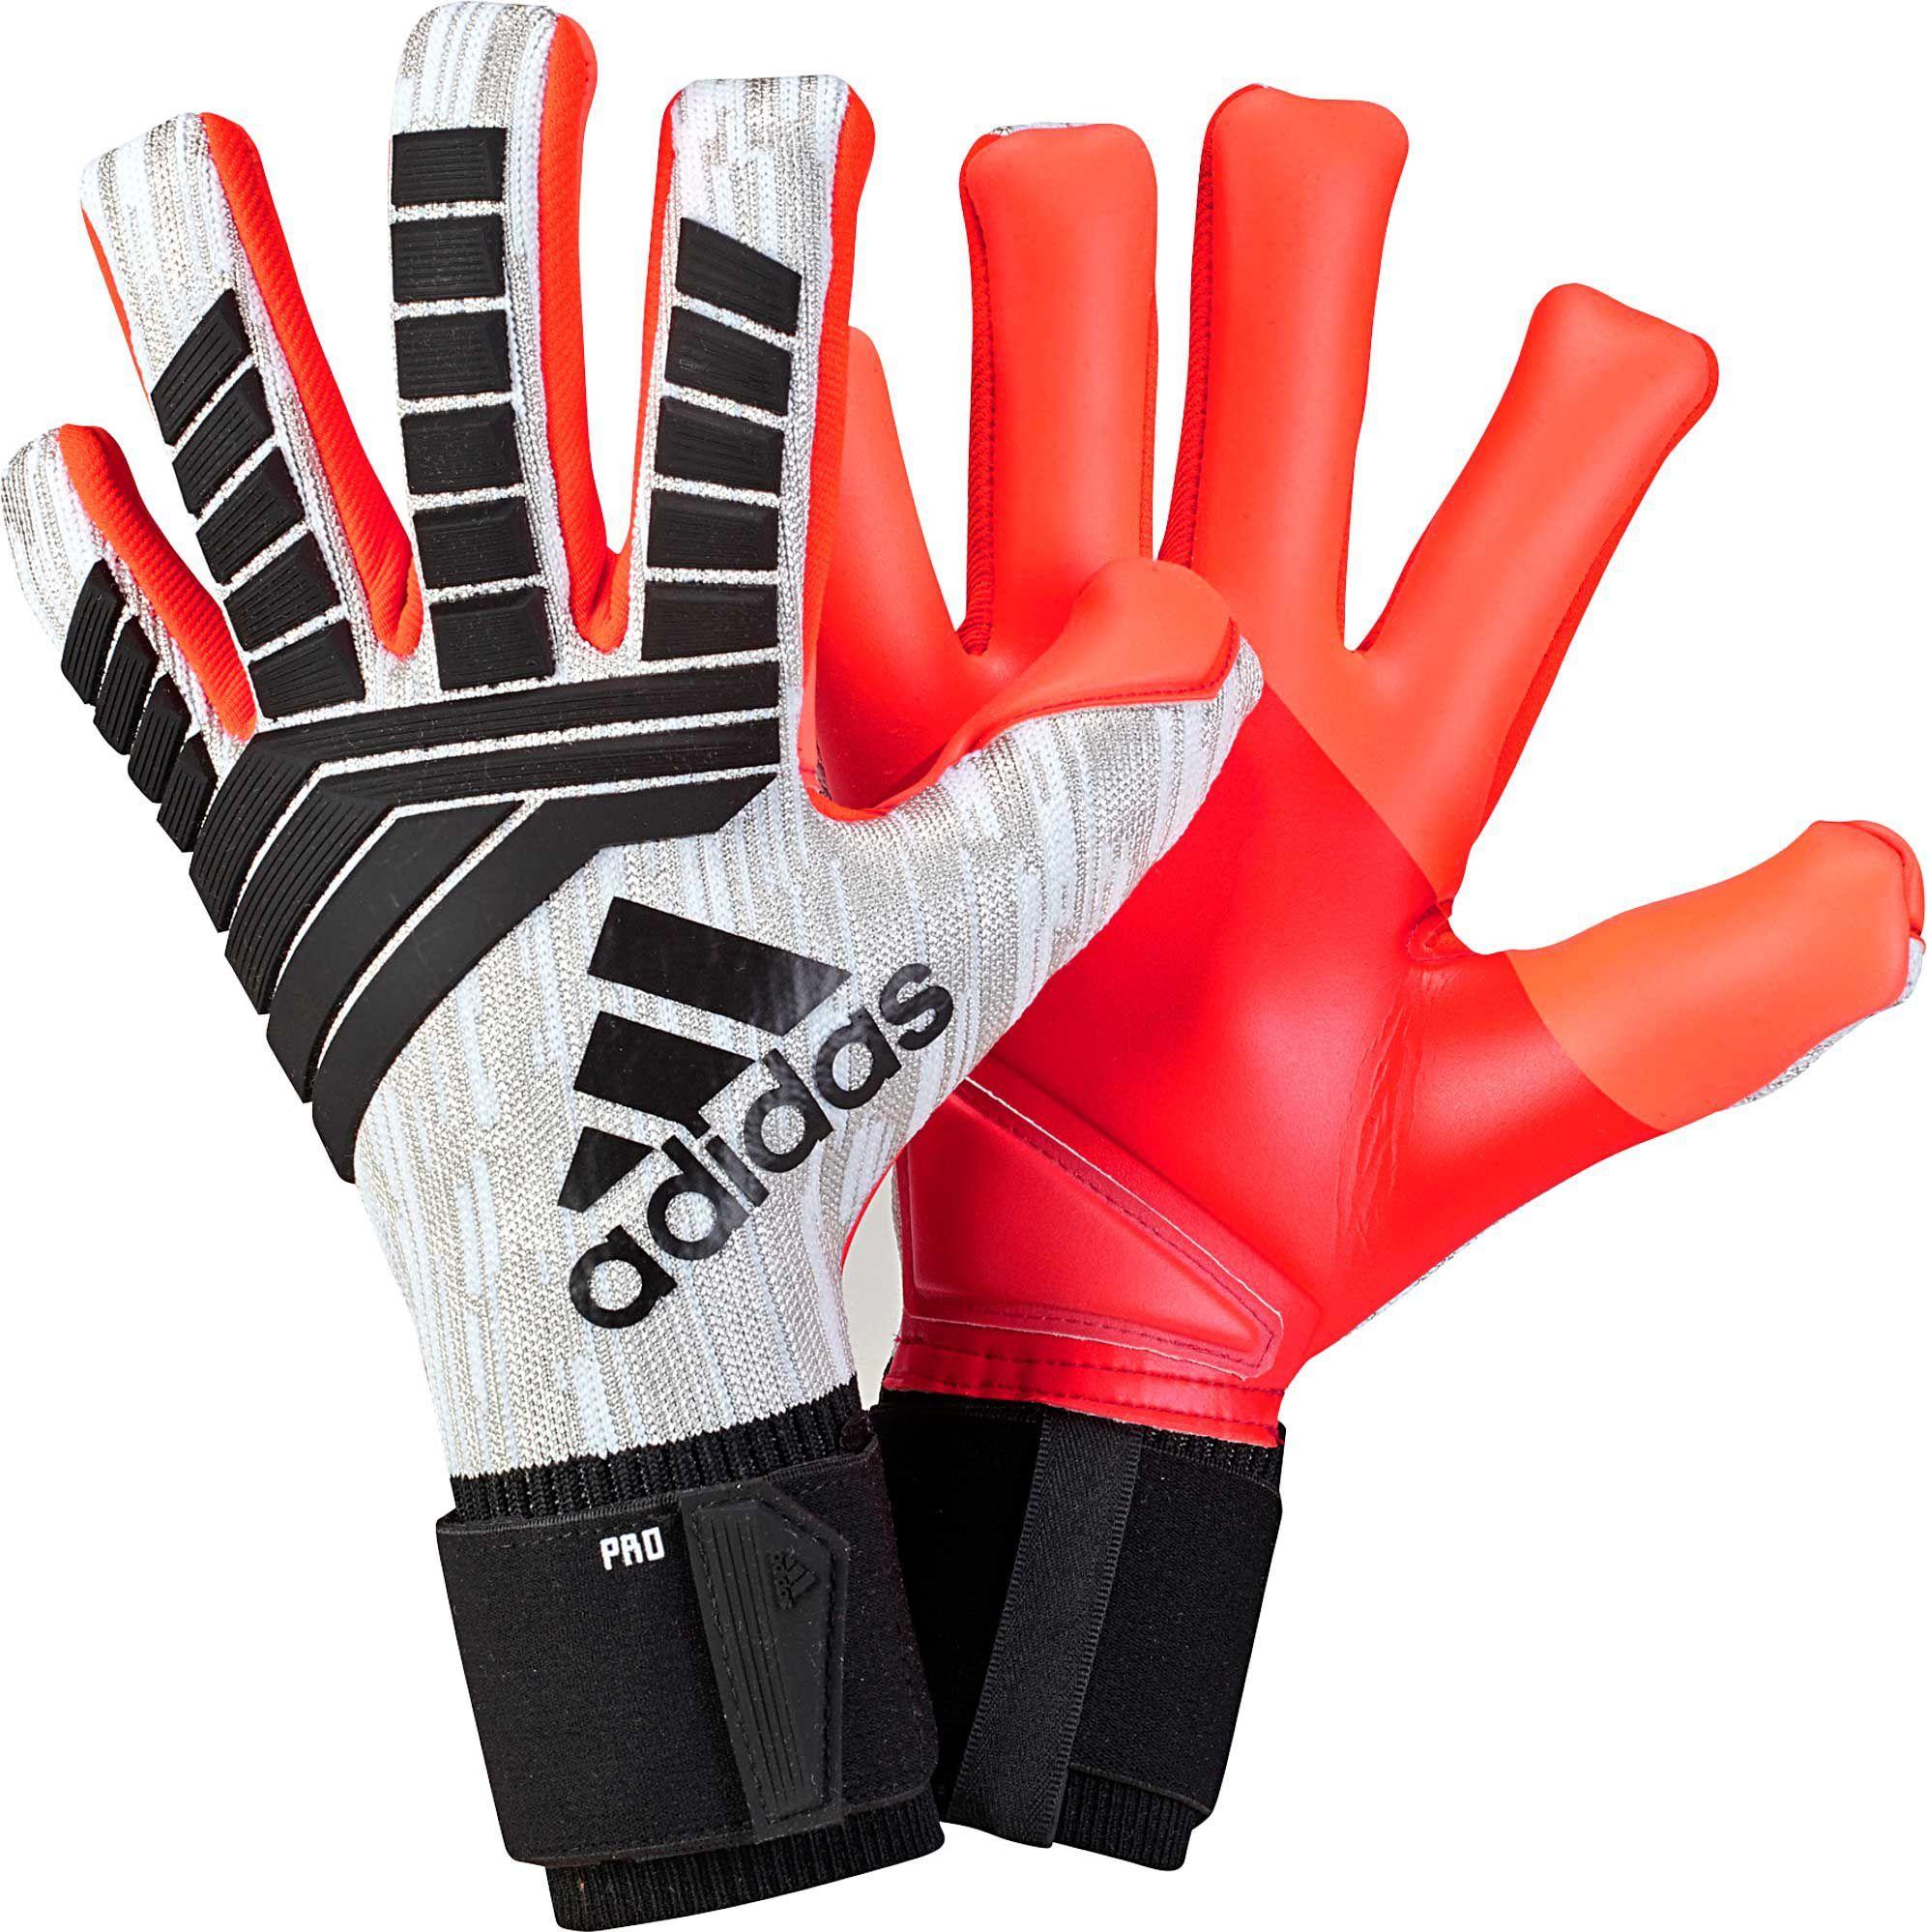 Adidas Adult Predator Pro Manuel Neuer Soccer Goalkeeper Gloves Luvas De Futebol Goleiro Camisa De Futebol